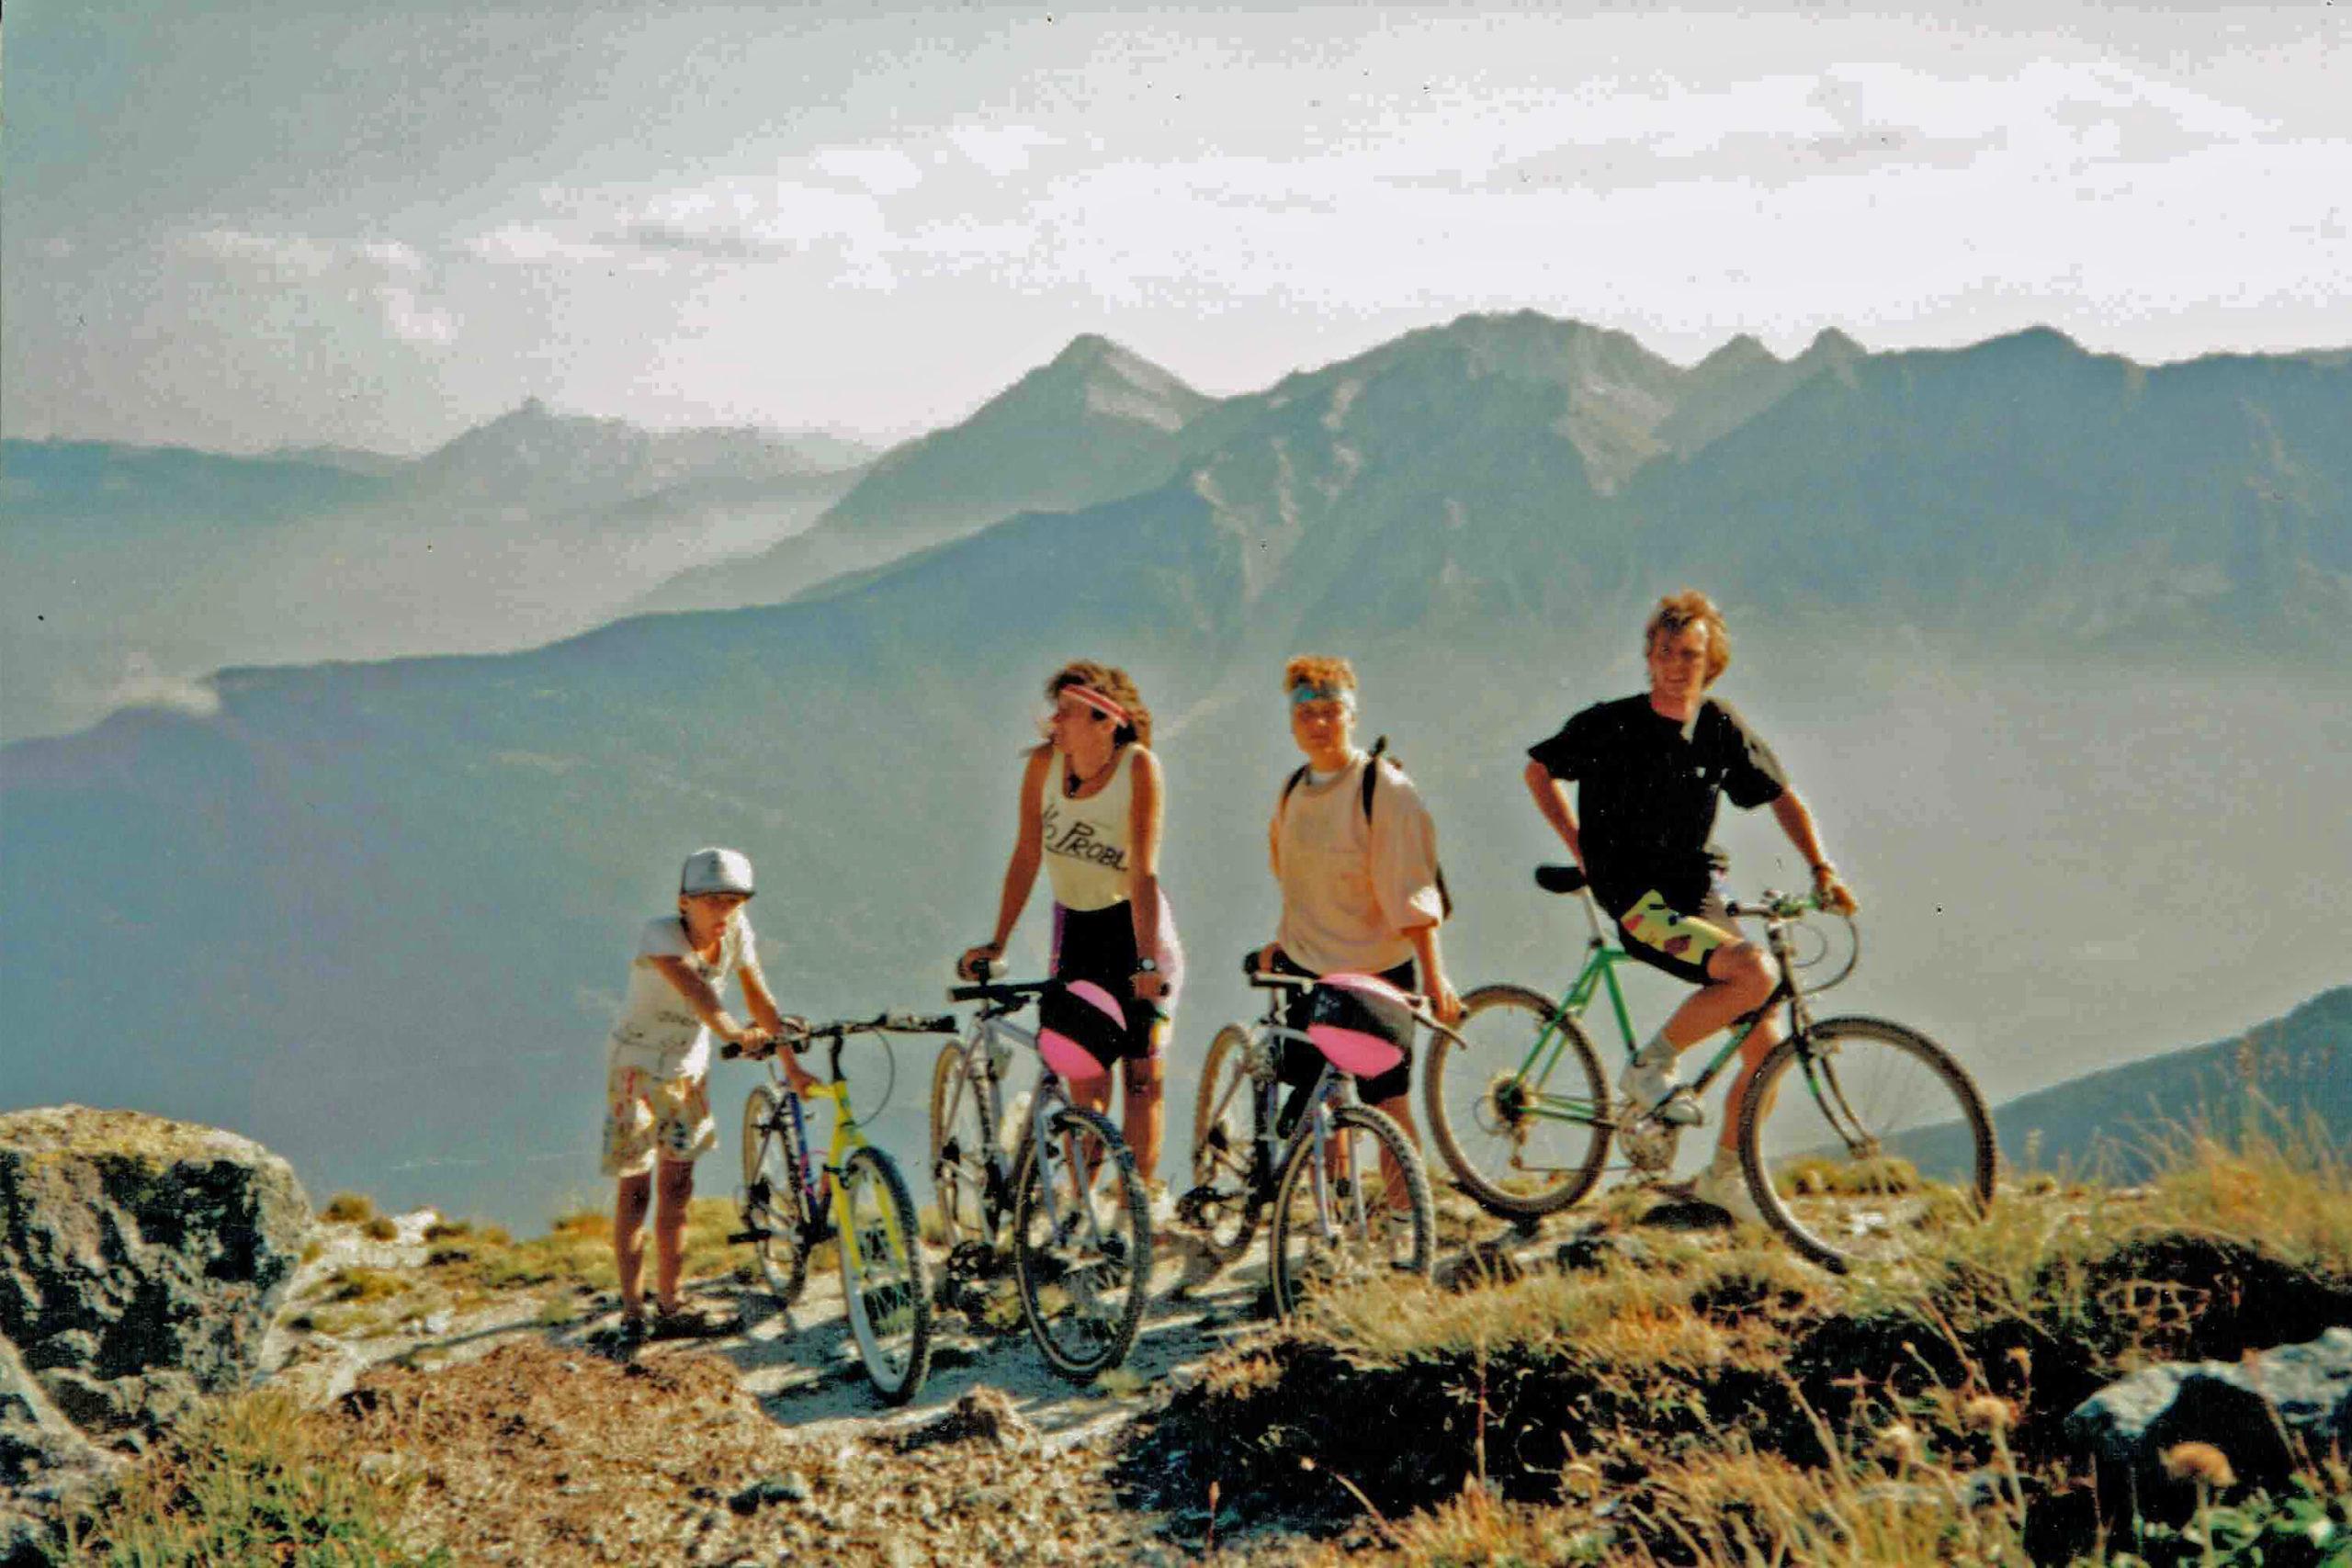 Radtour am Berg mit Kindern